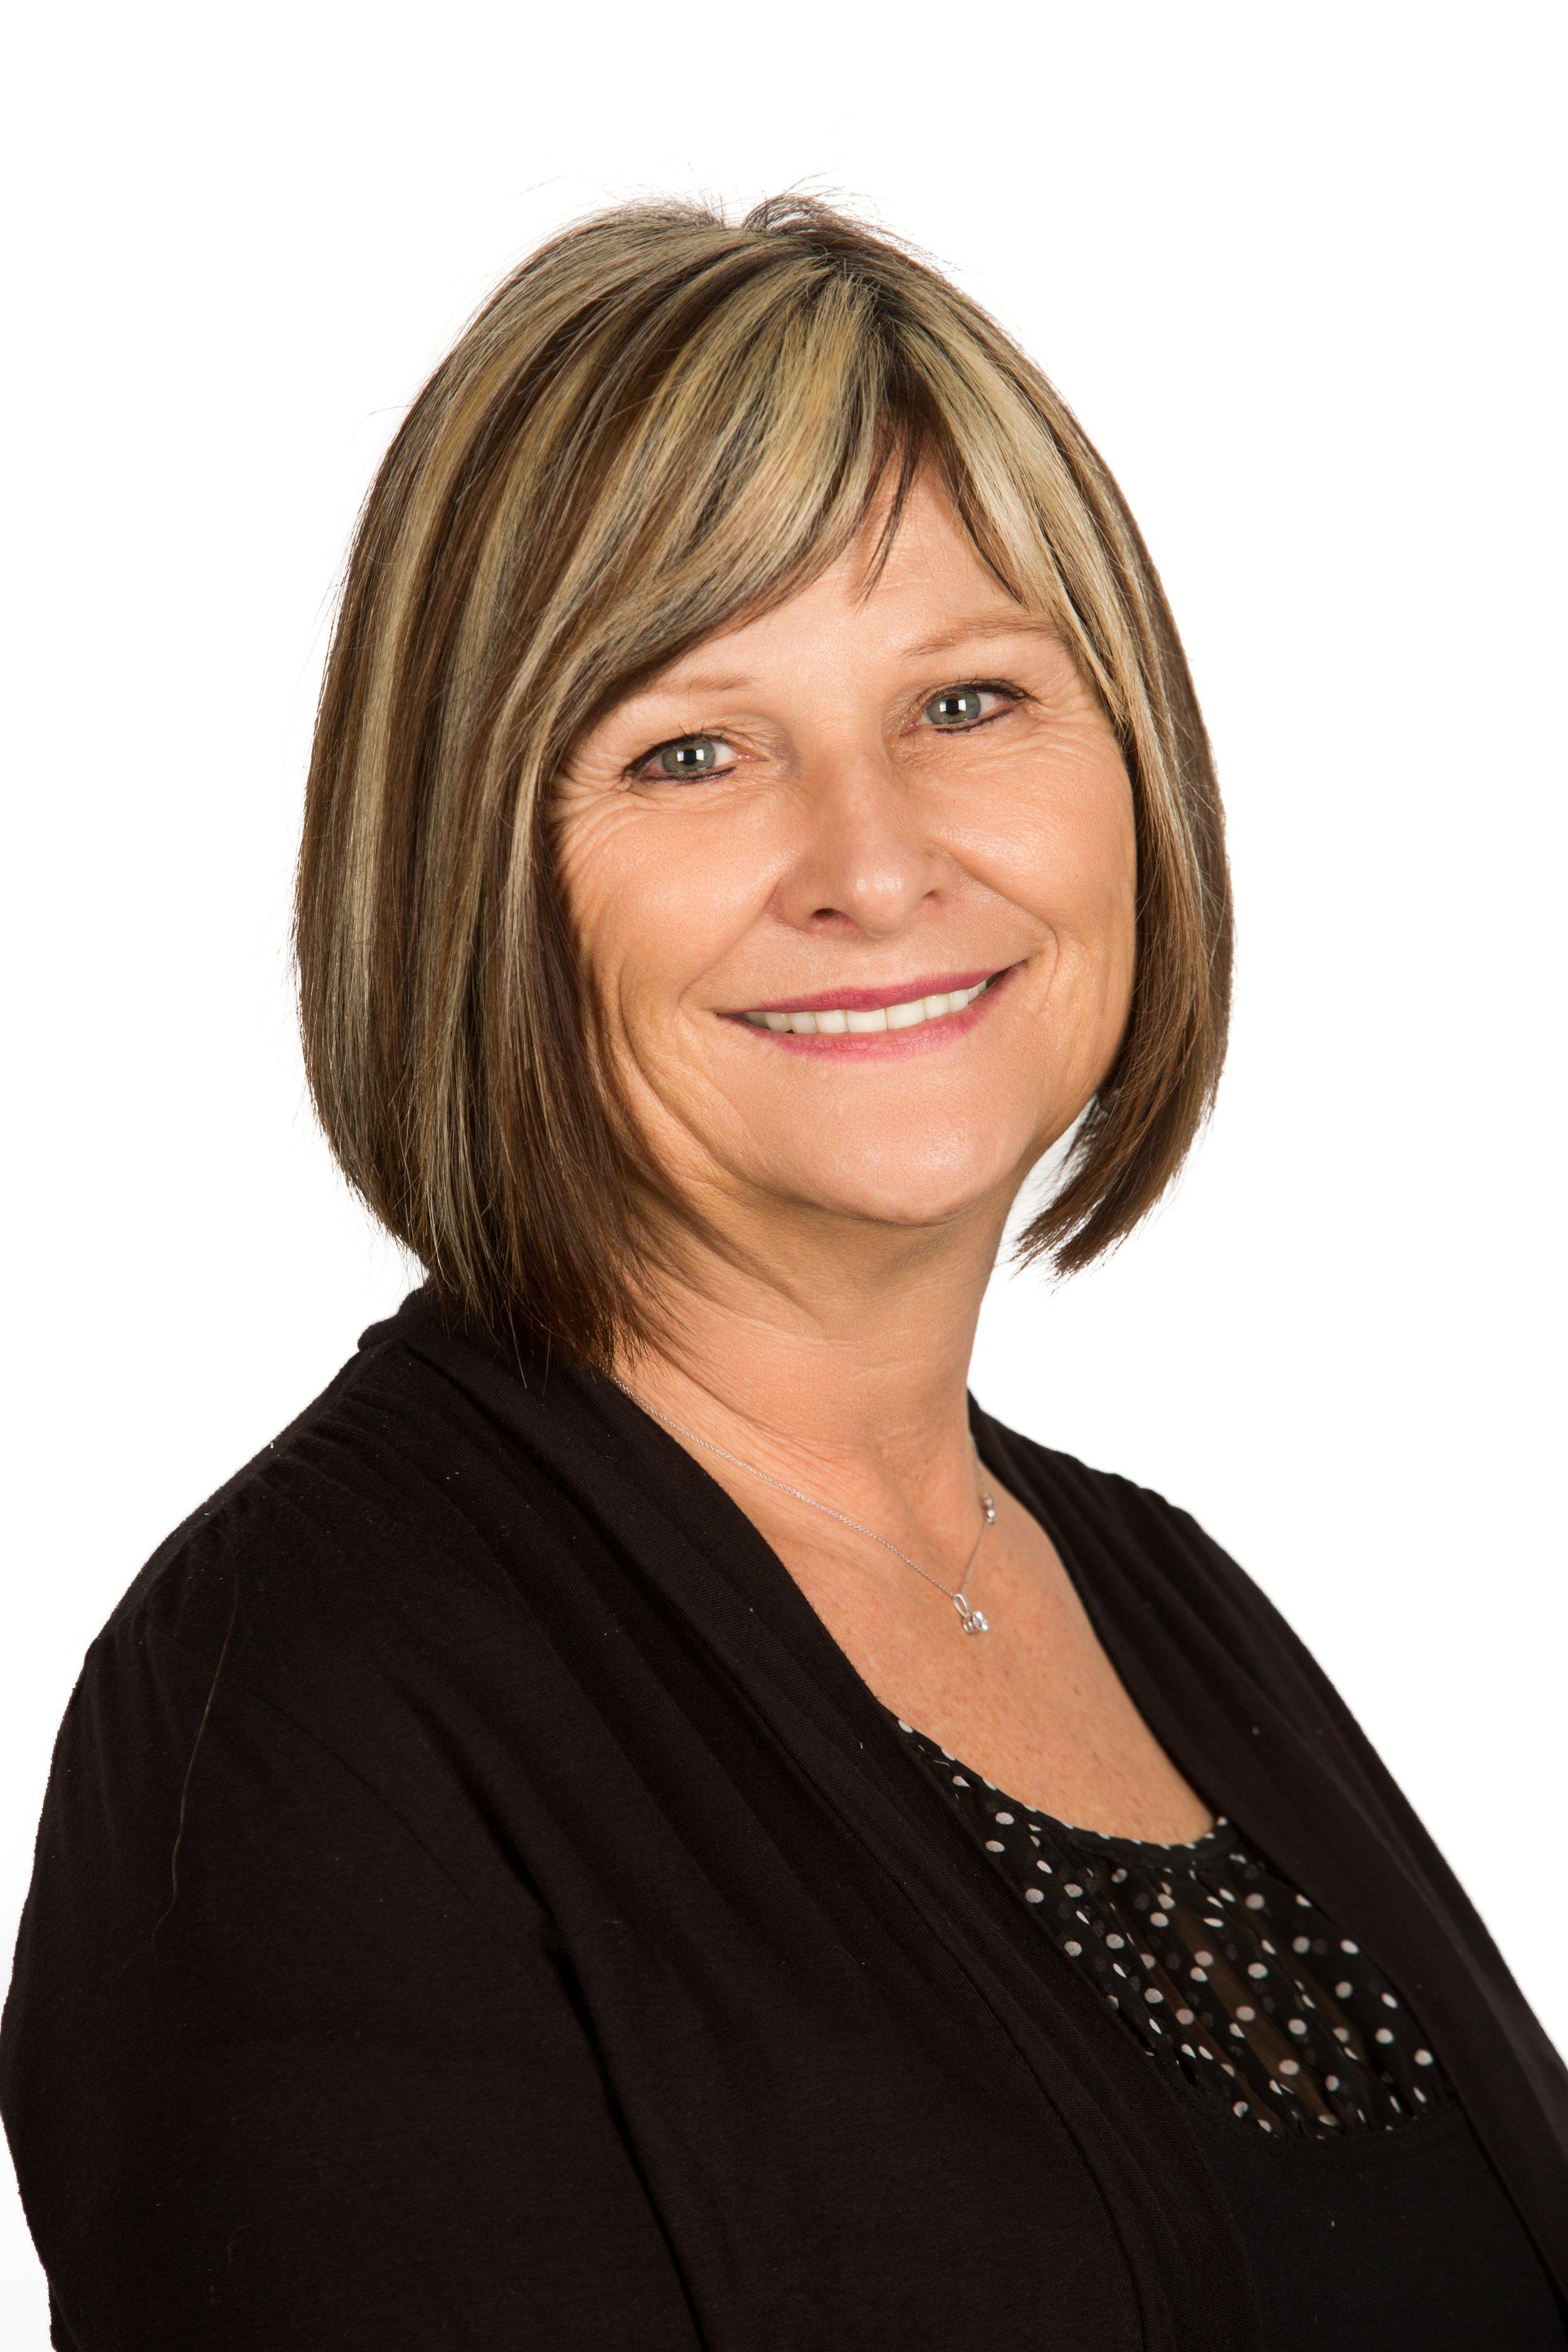 Evelyn Yackulic, Operations Manager